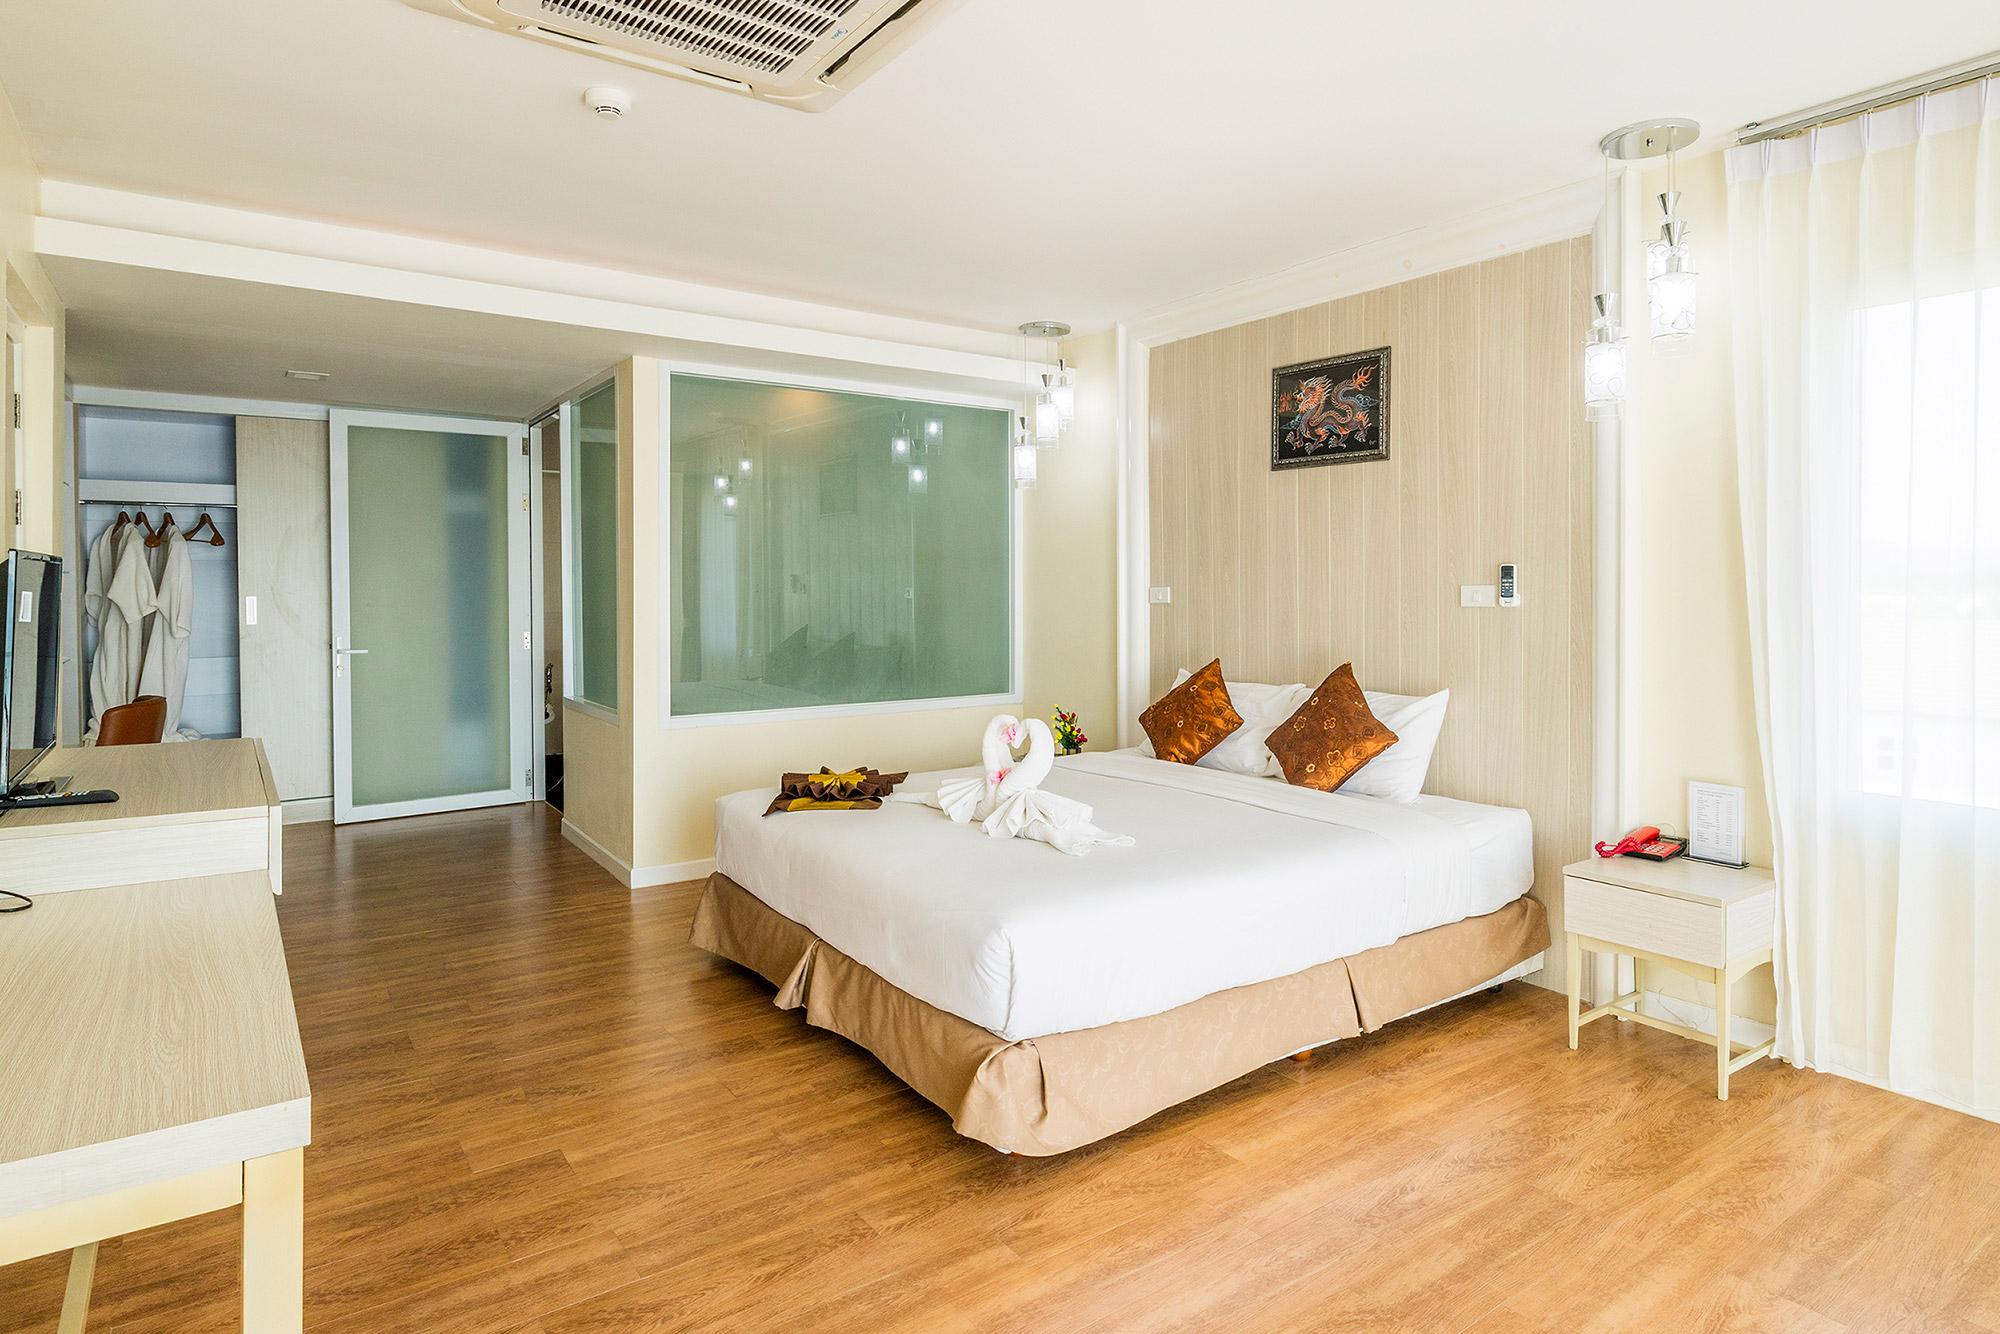 Saint Tropez Beach Resort Hotel ห้องเอ็กเซ็กคูทีฟสวีท  โรงแรม เซนต์ โทรเปซ บีช รีสอร์ท โฮเทล จันทบุรี สวยติดหาด อ่าวคุ้งกระเบน IMG 5803